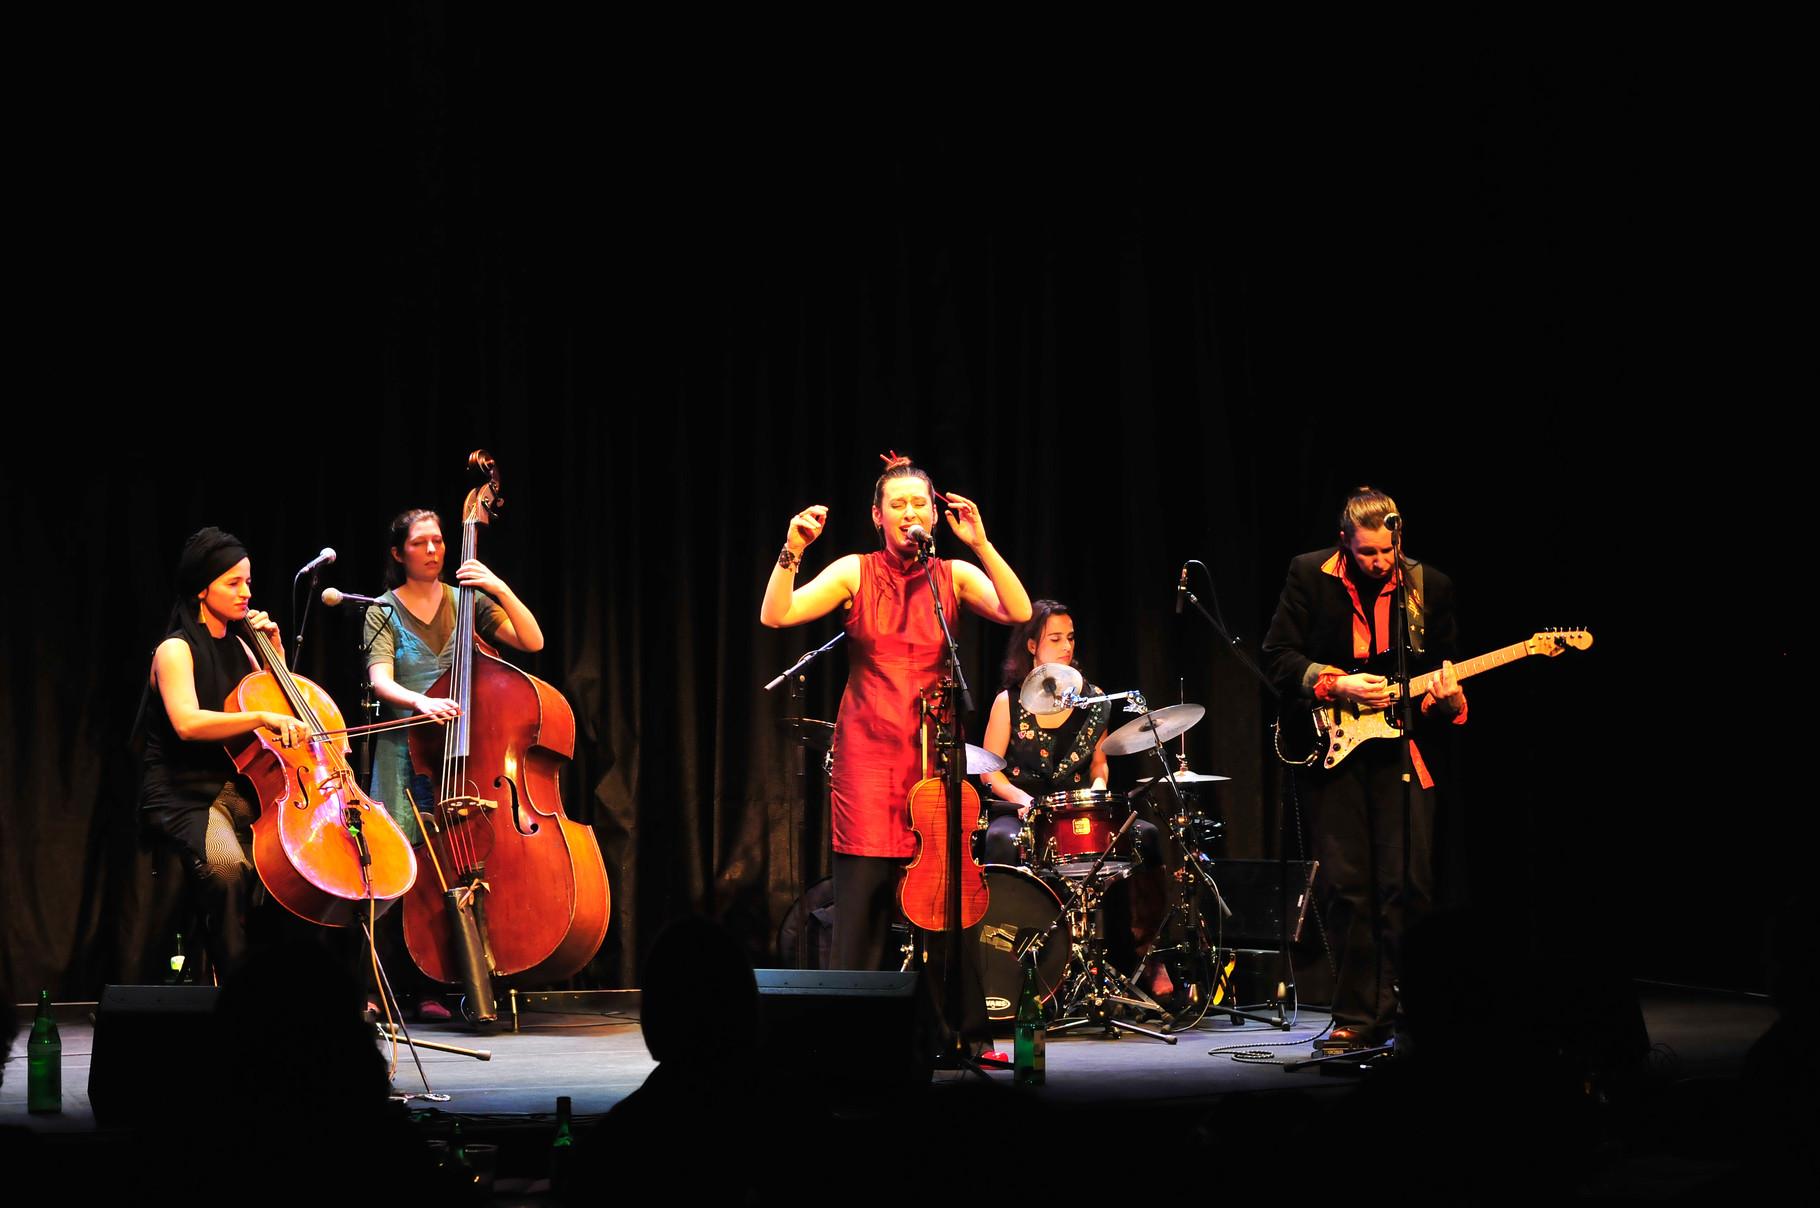 Madame Baheux @ Nestroyhof Theater, Vienna (Foto: Nick Mangafas)